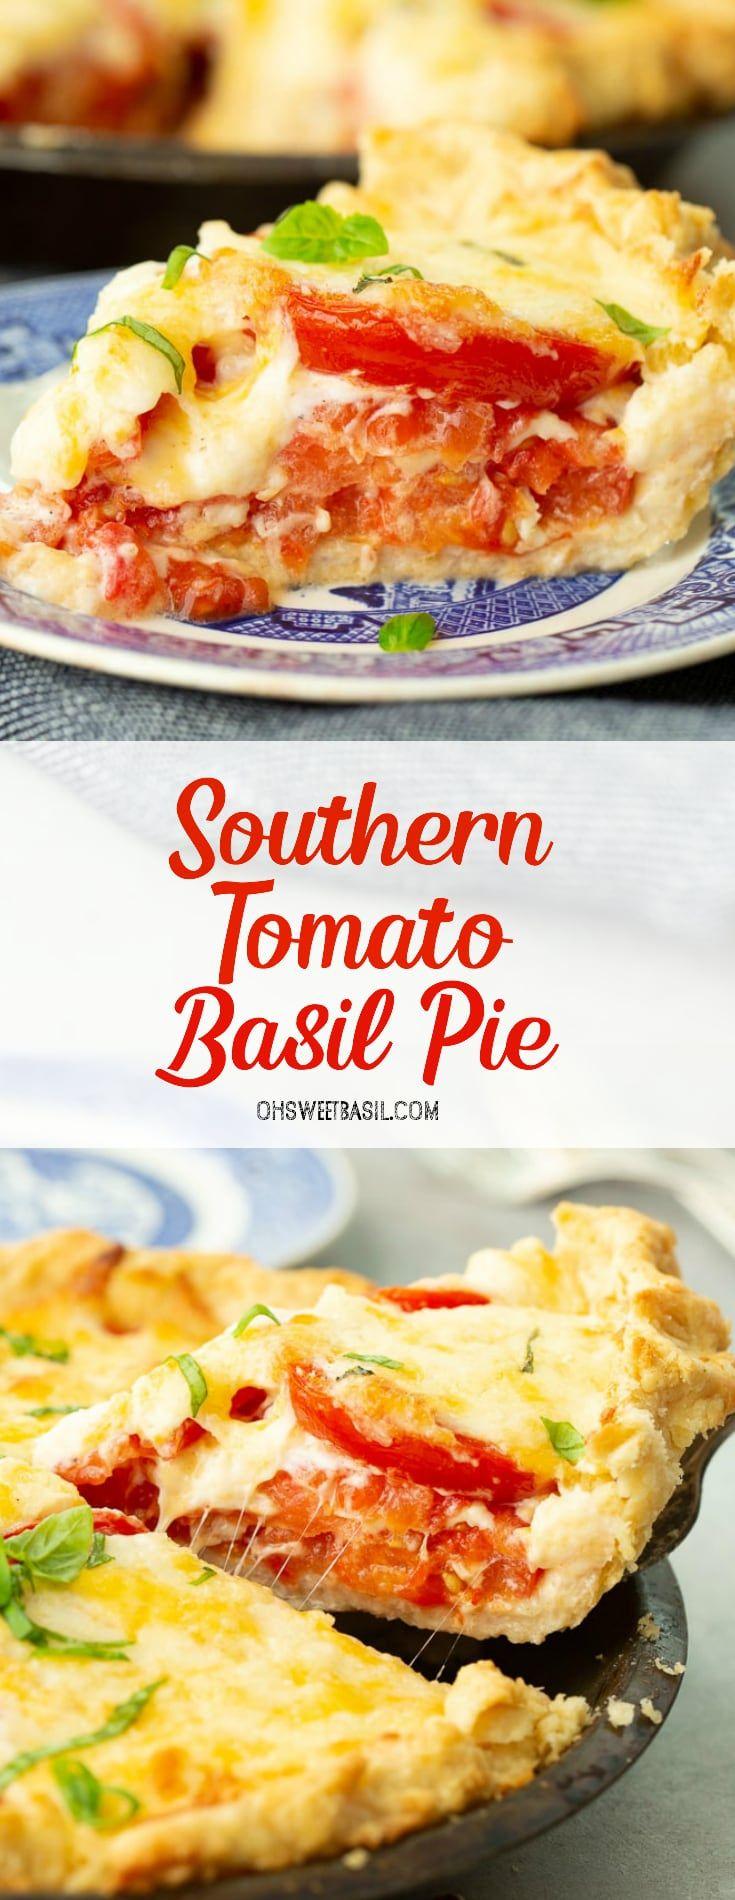 Southern Tomato Basil Pie